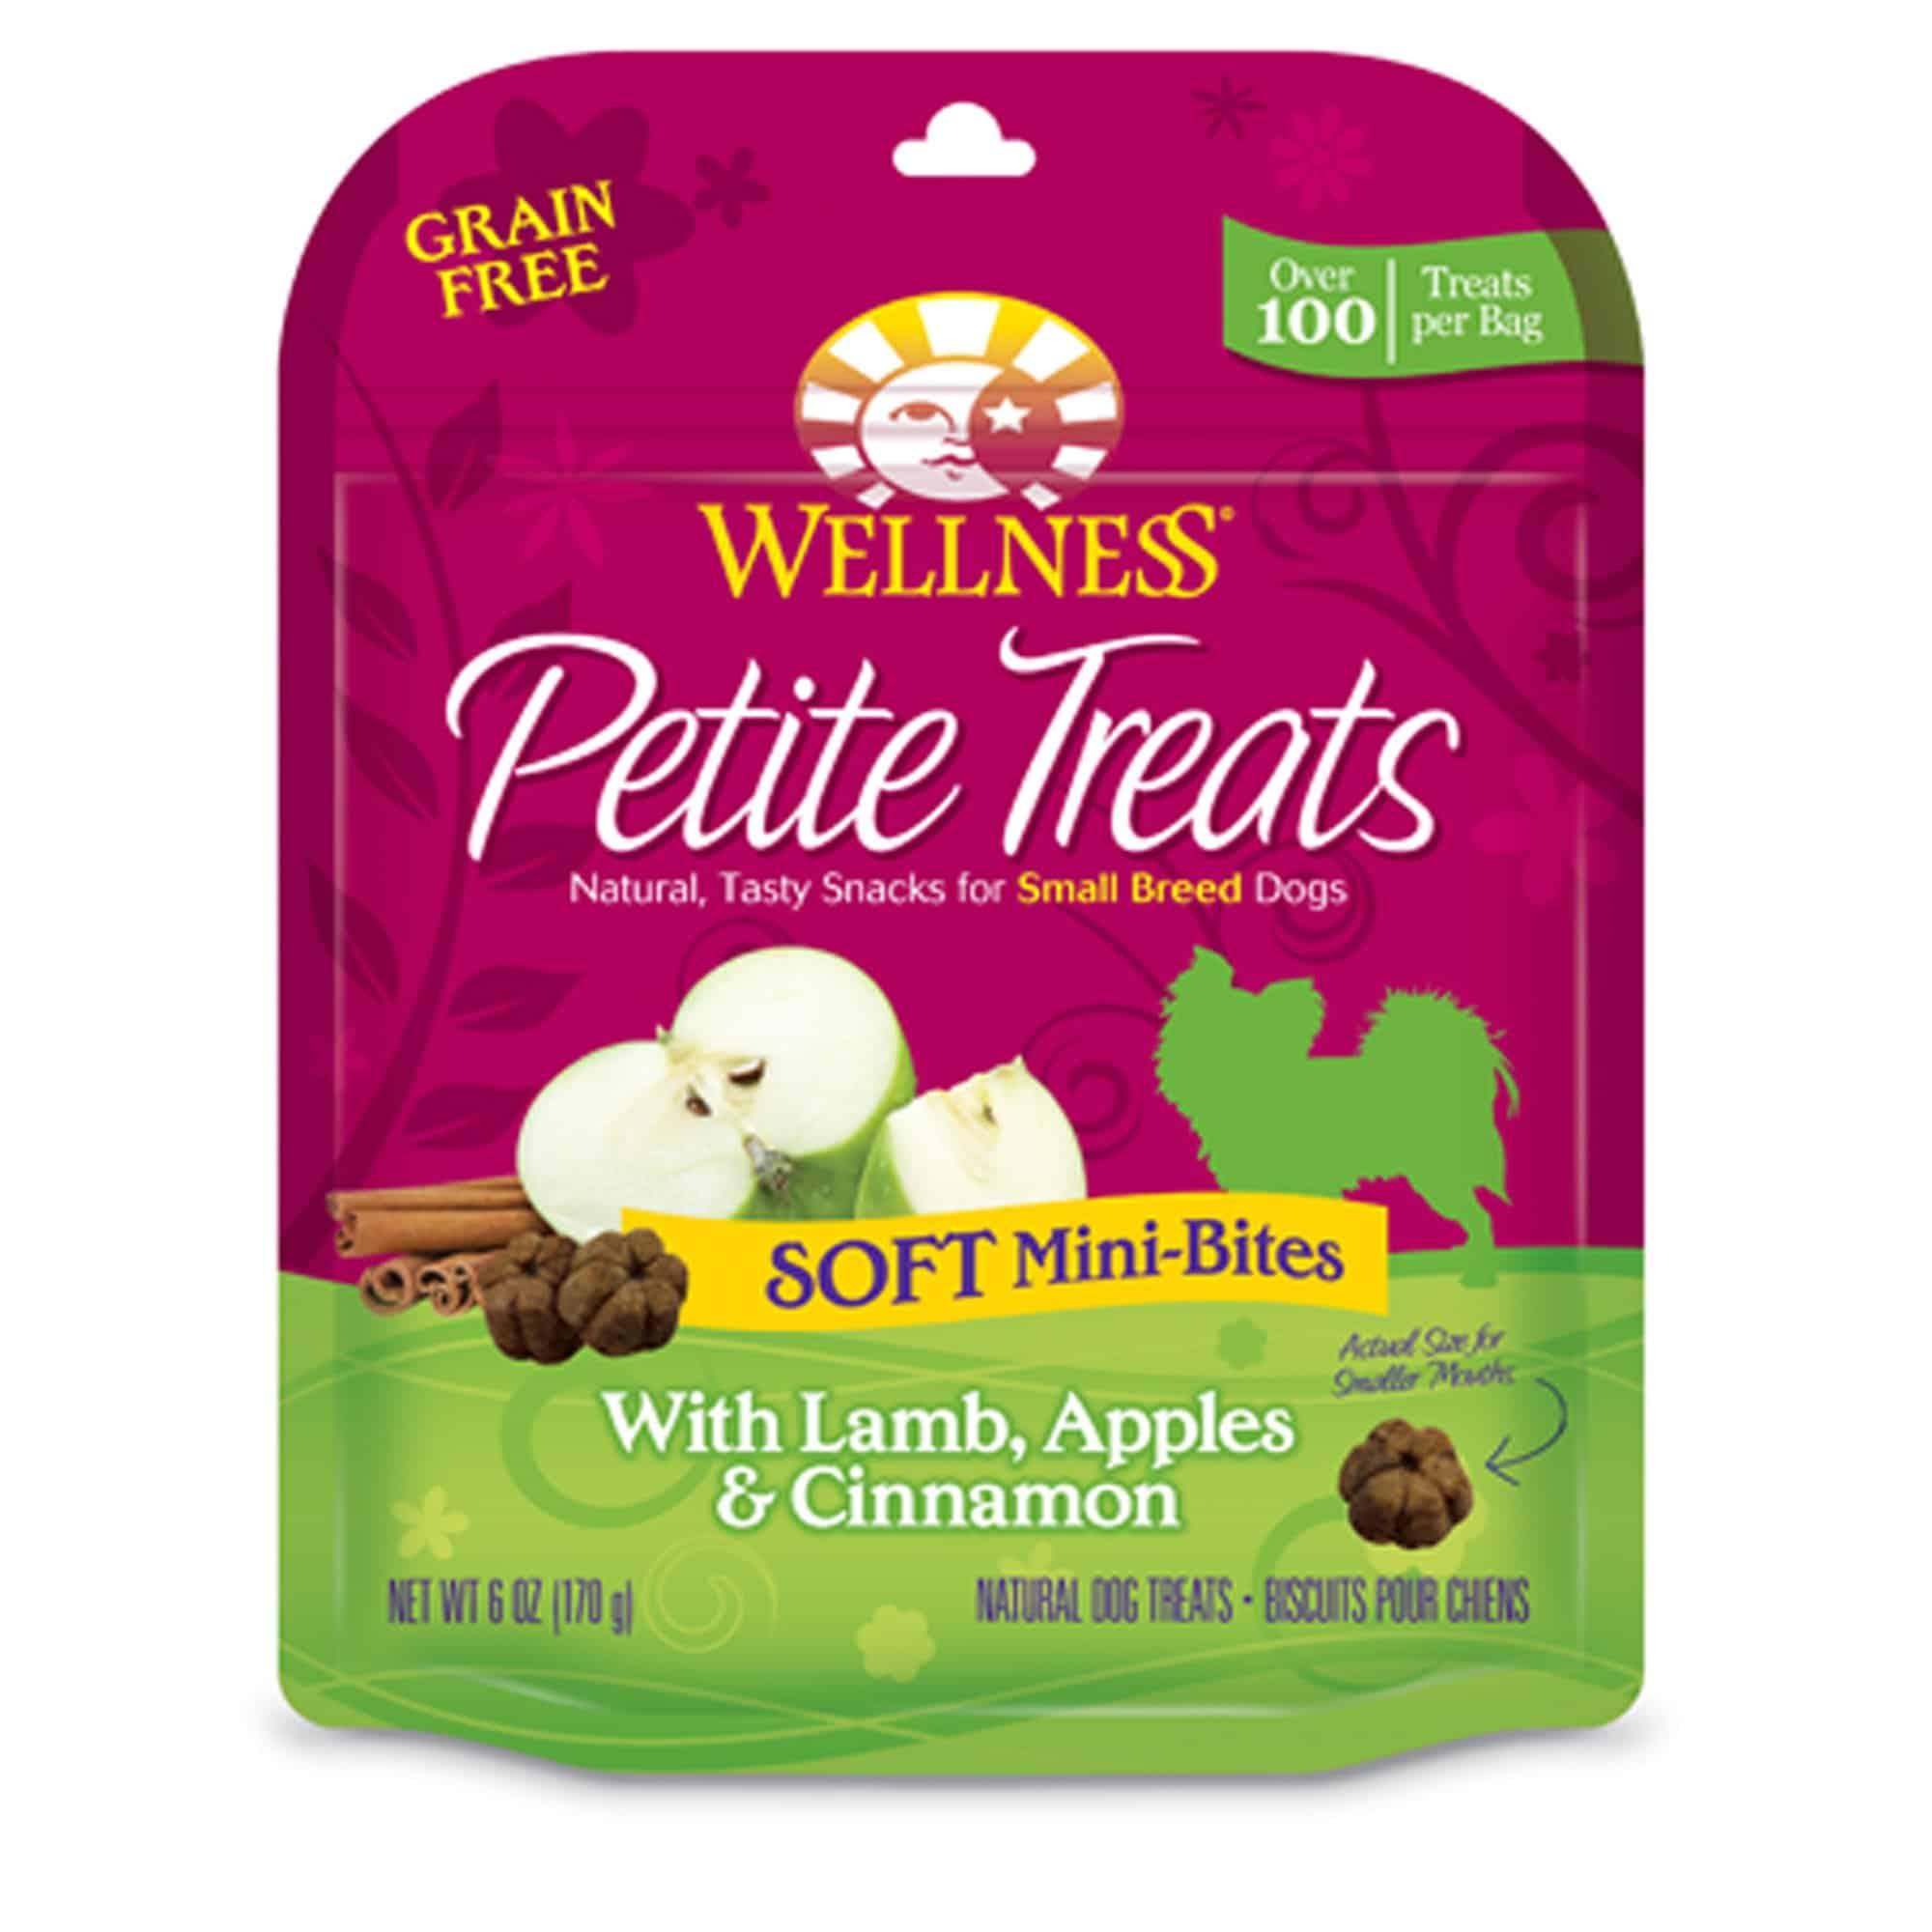 Wellness Grain Free Petite Treats - Lamb, Apple & Cinnamon